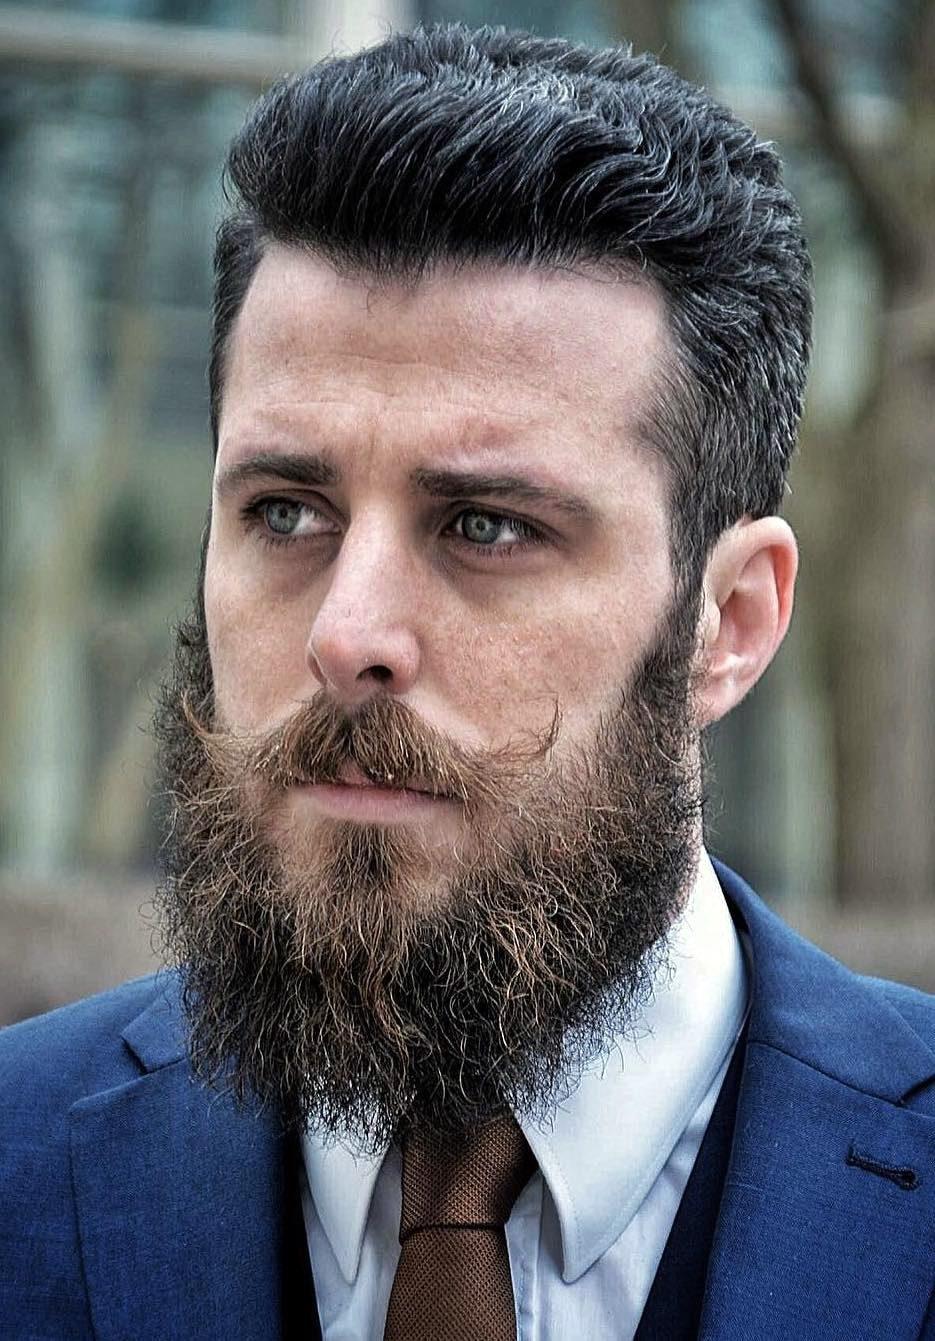 Van Dyke Moustache